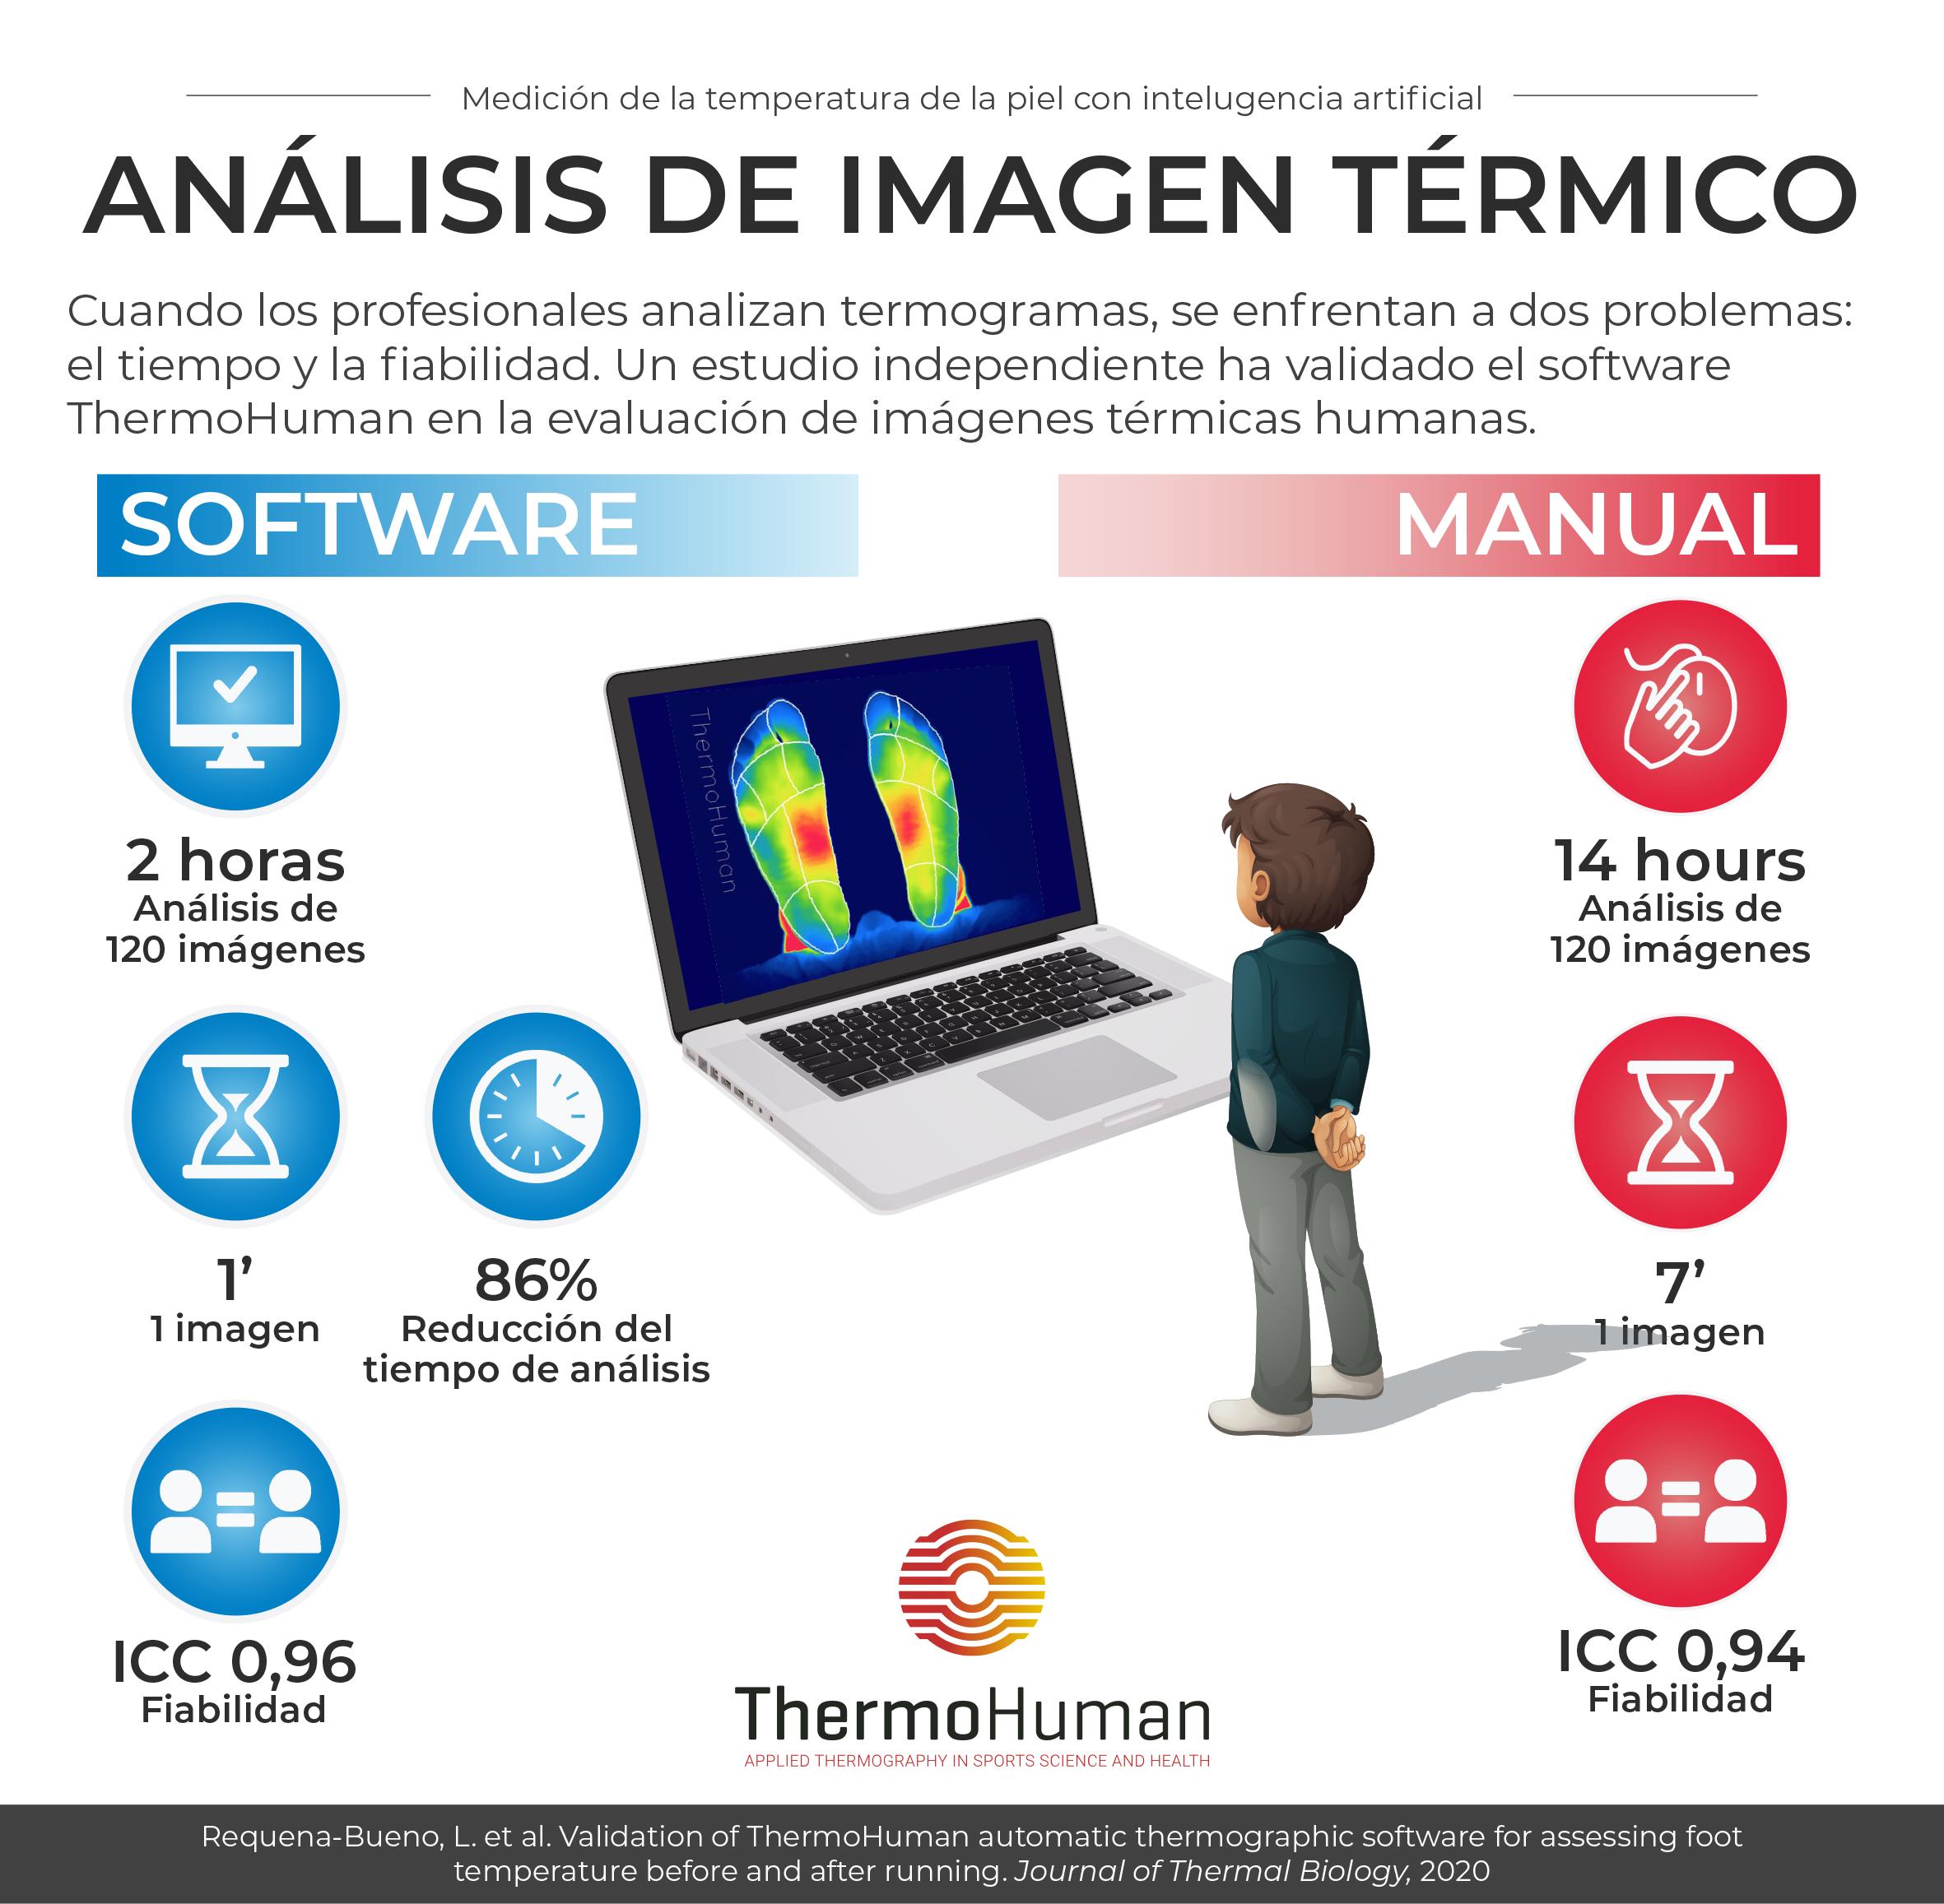 Análisis de termografía automático o manual